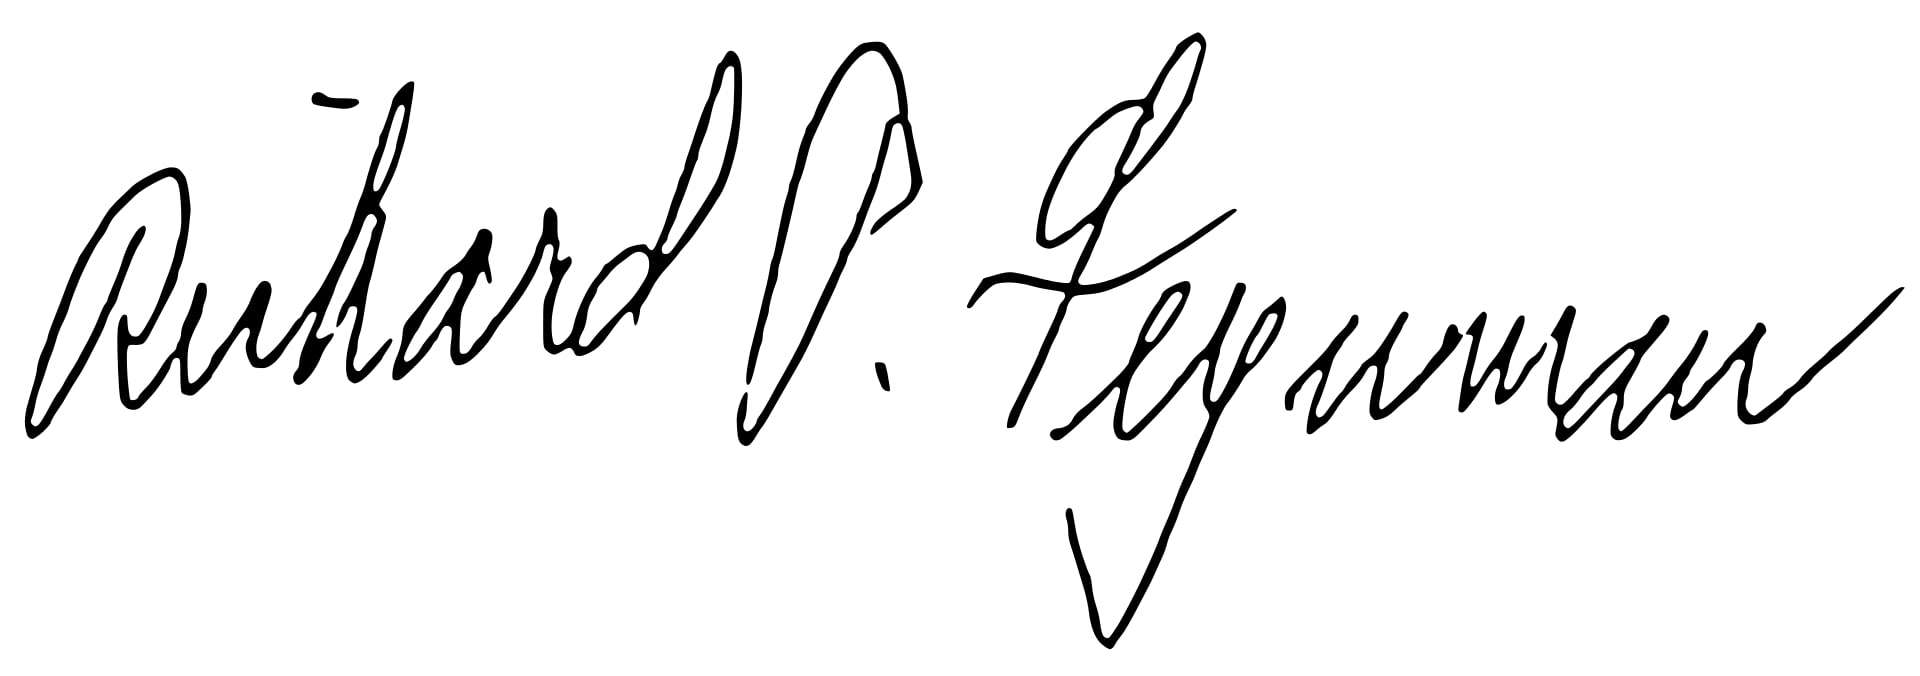 Richard Feynman Signature